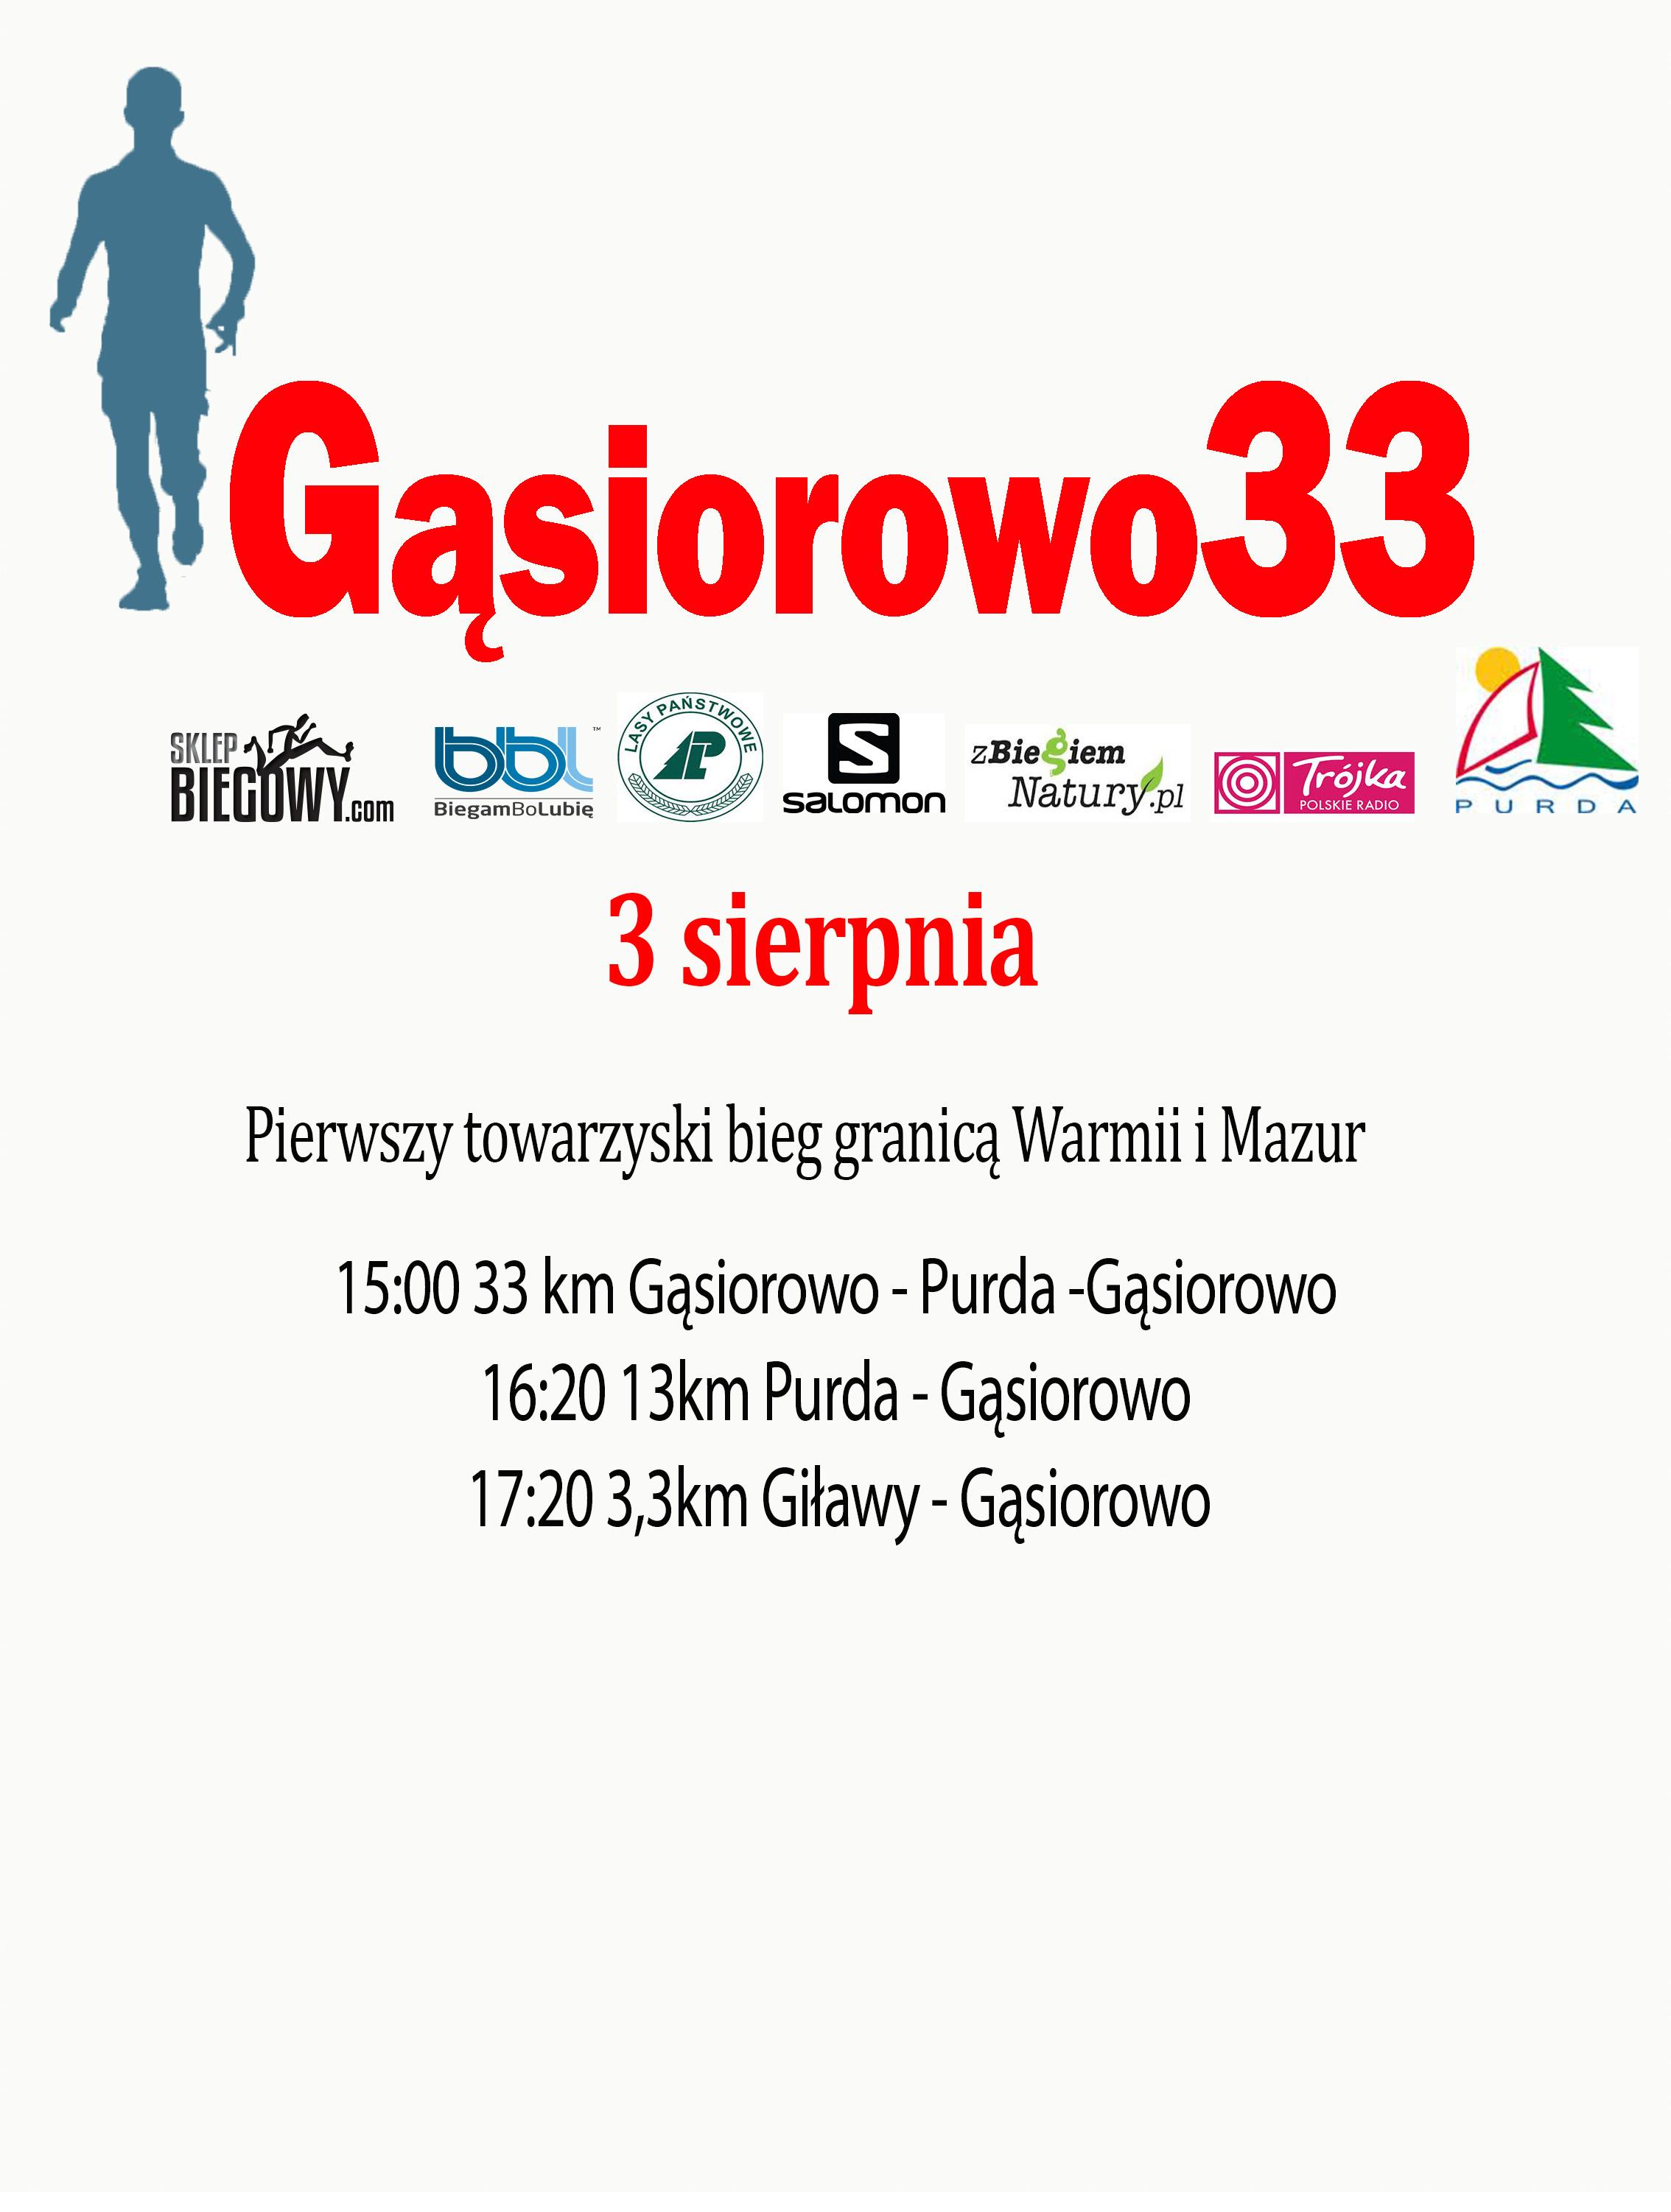 gasirowo33plakatjpg [2268x3003]